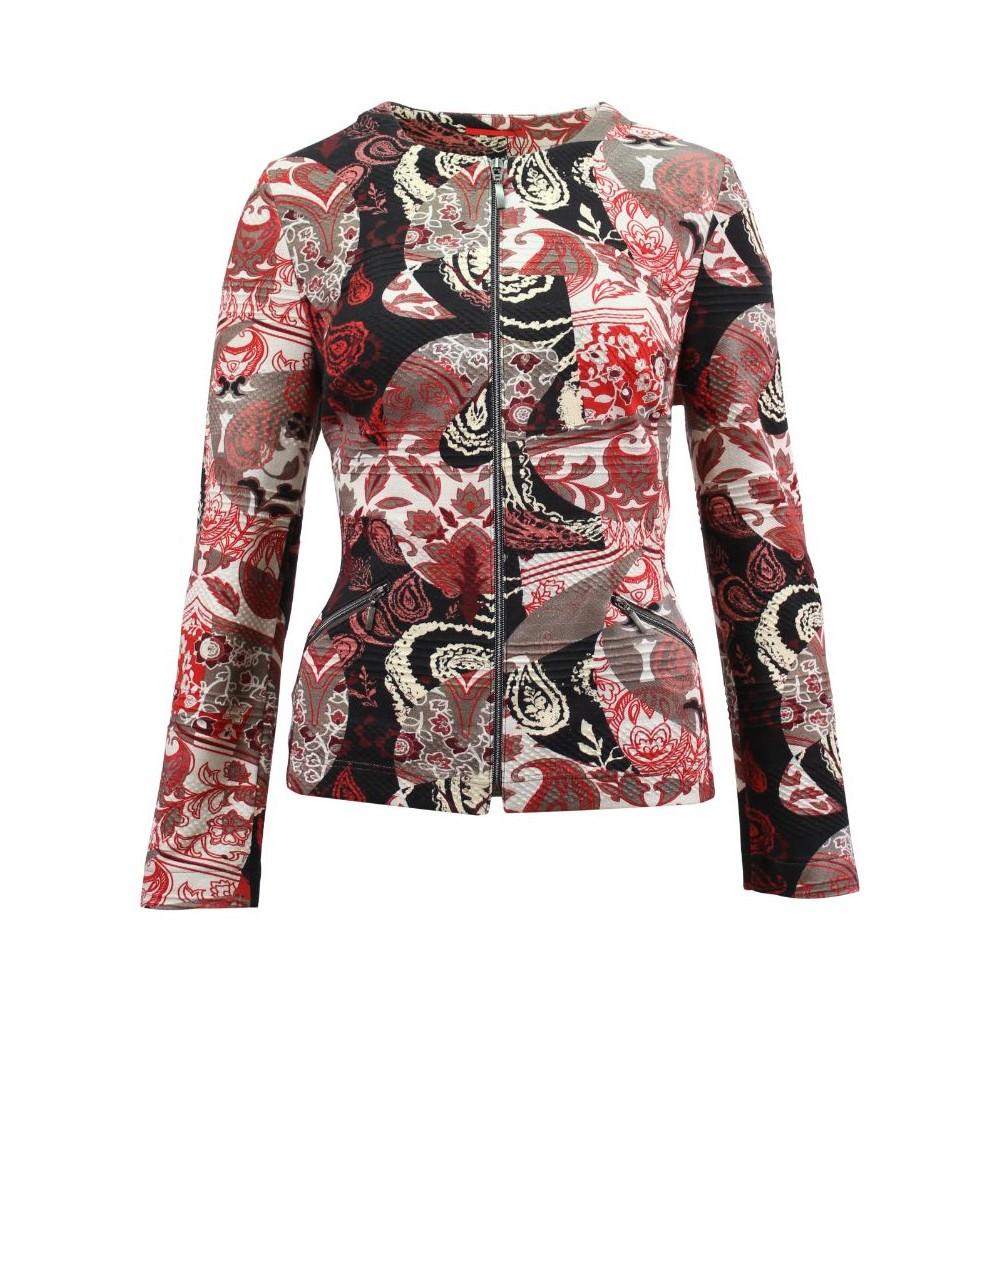 Paisley Lebek Blazer Jacket Barbara Lebek Fashions  Irish Handcrafts 2